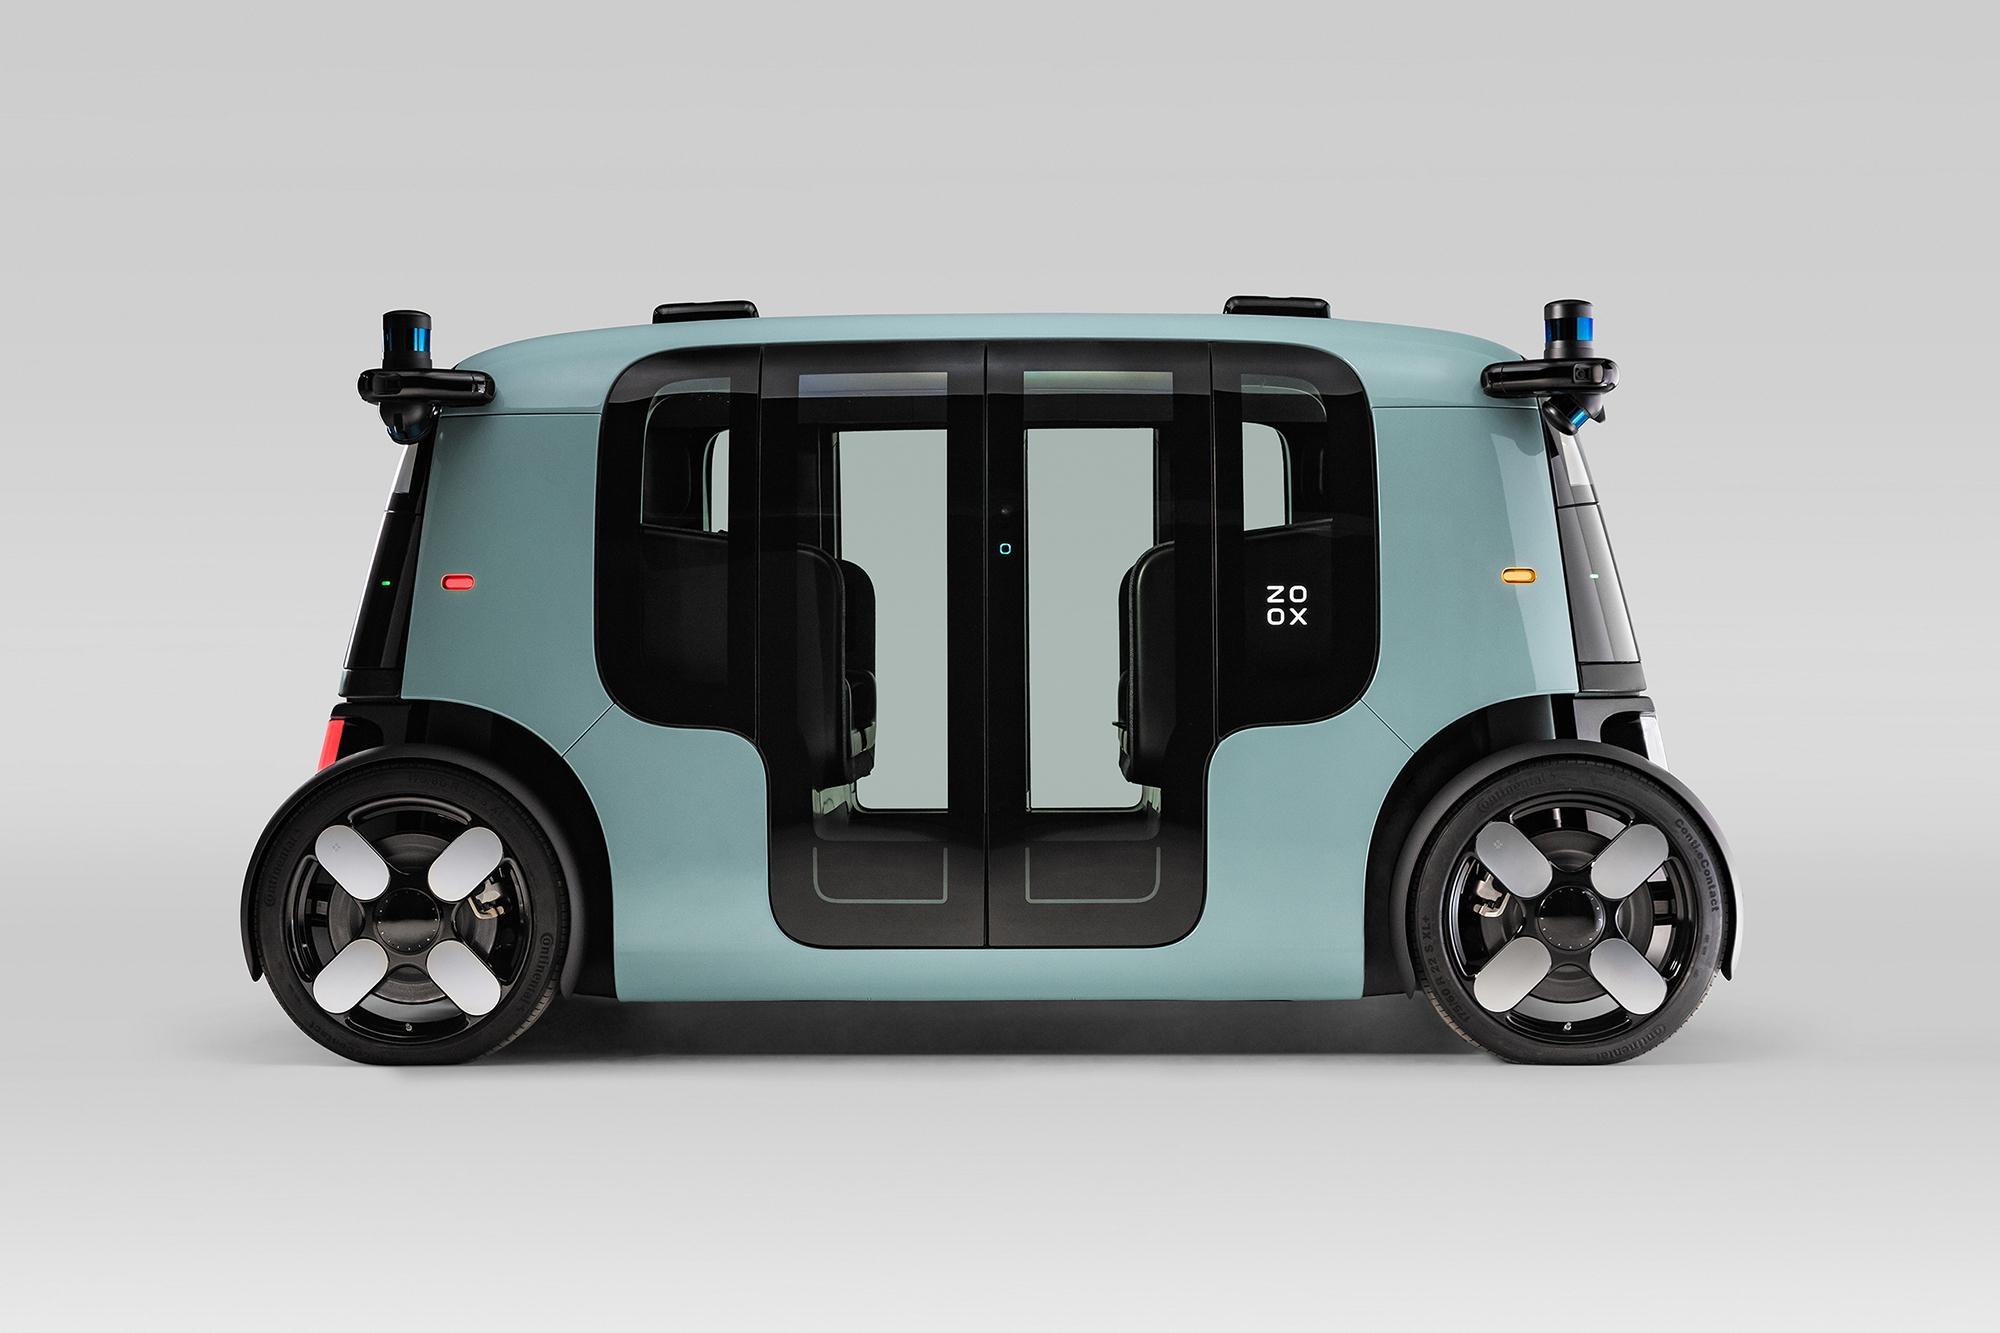 Mobility company Zoox revealed  - weareellectric   ello